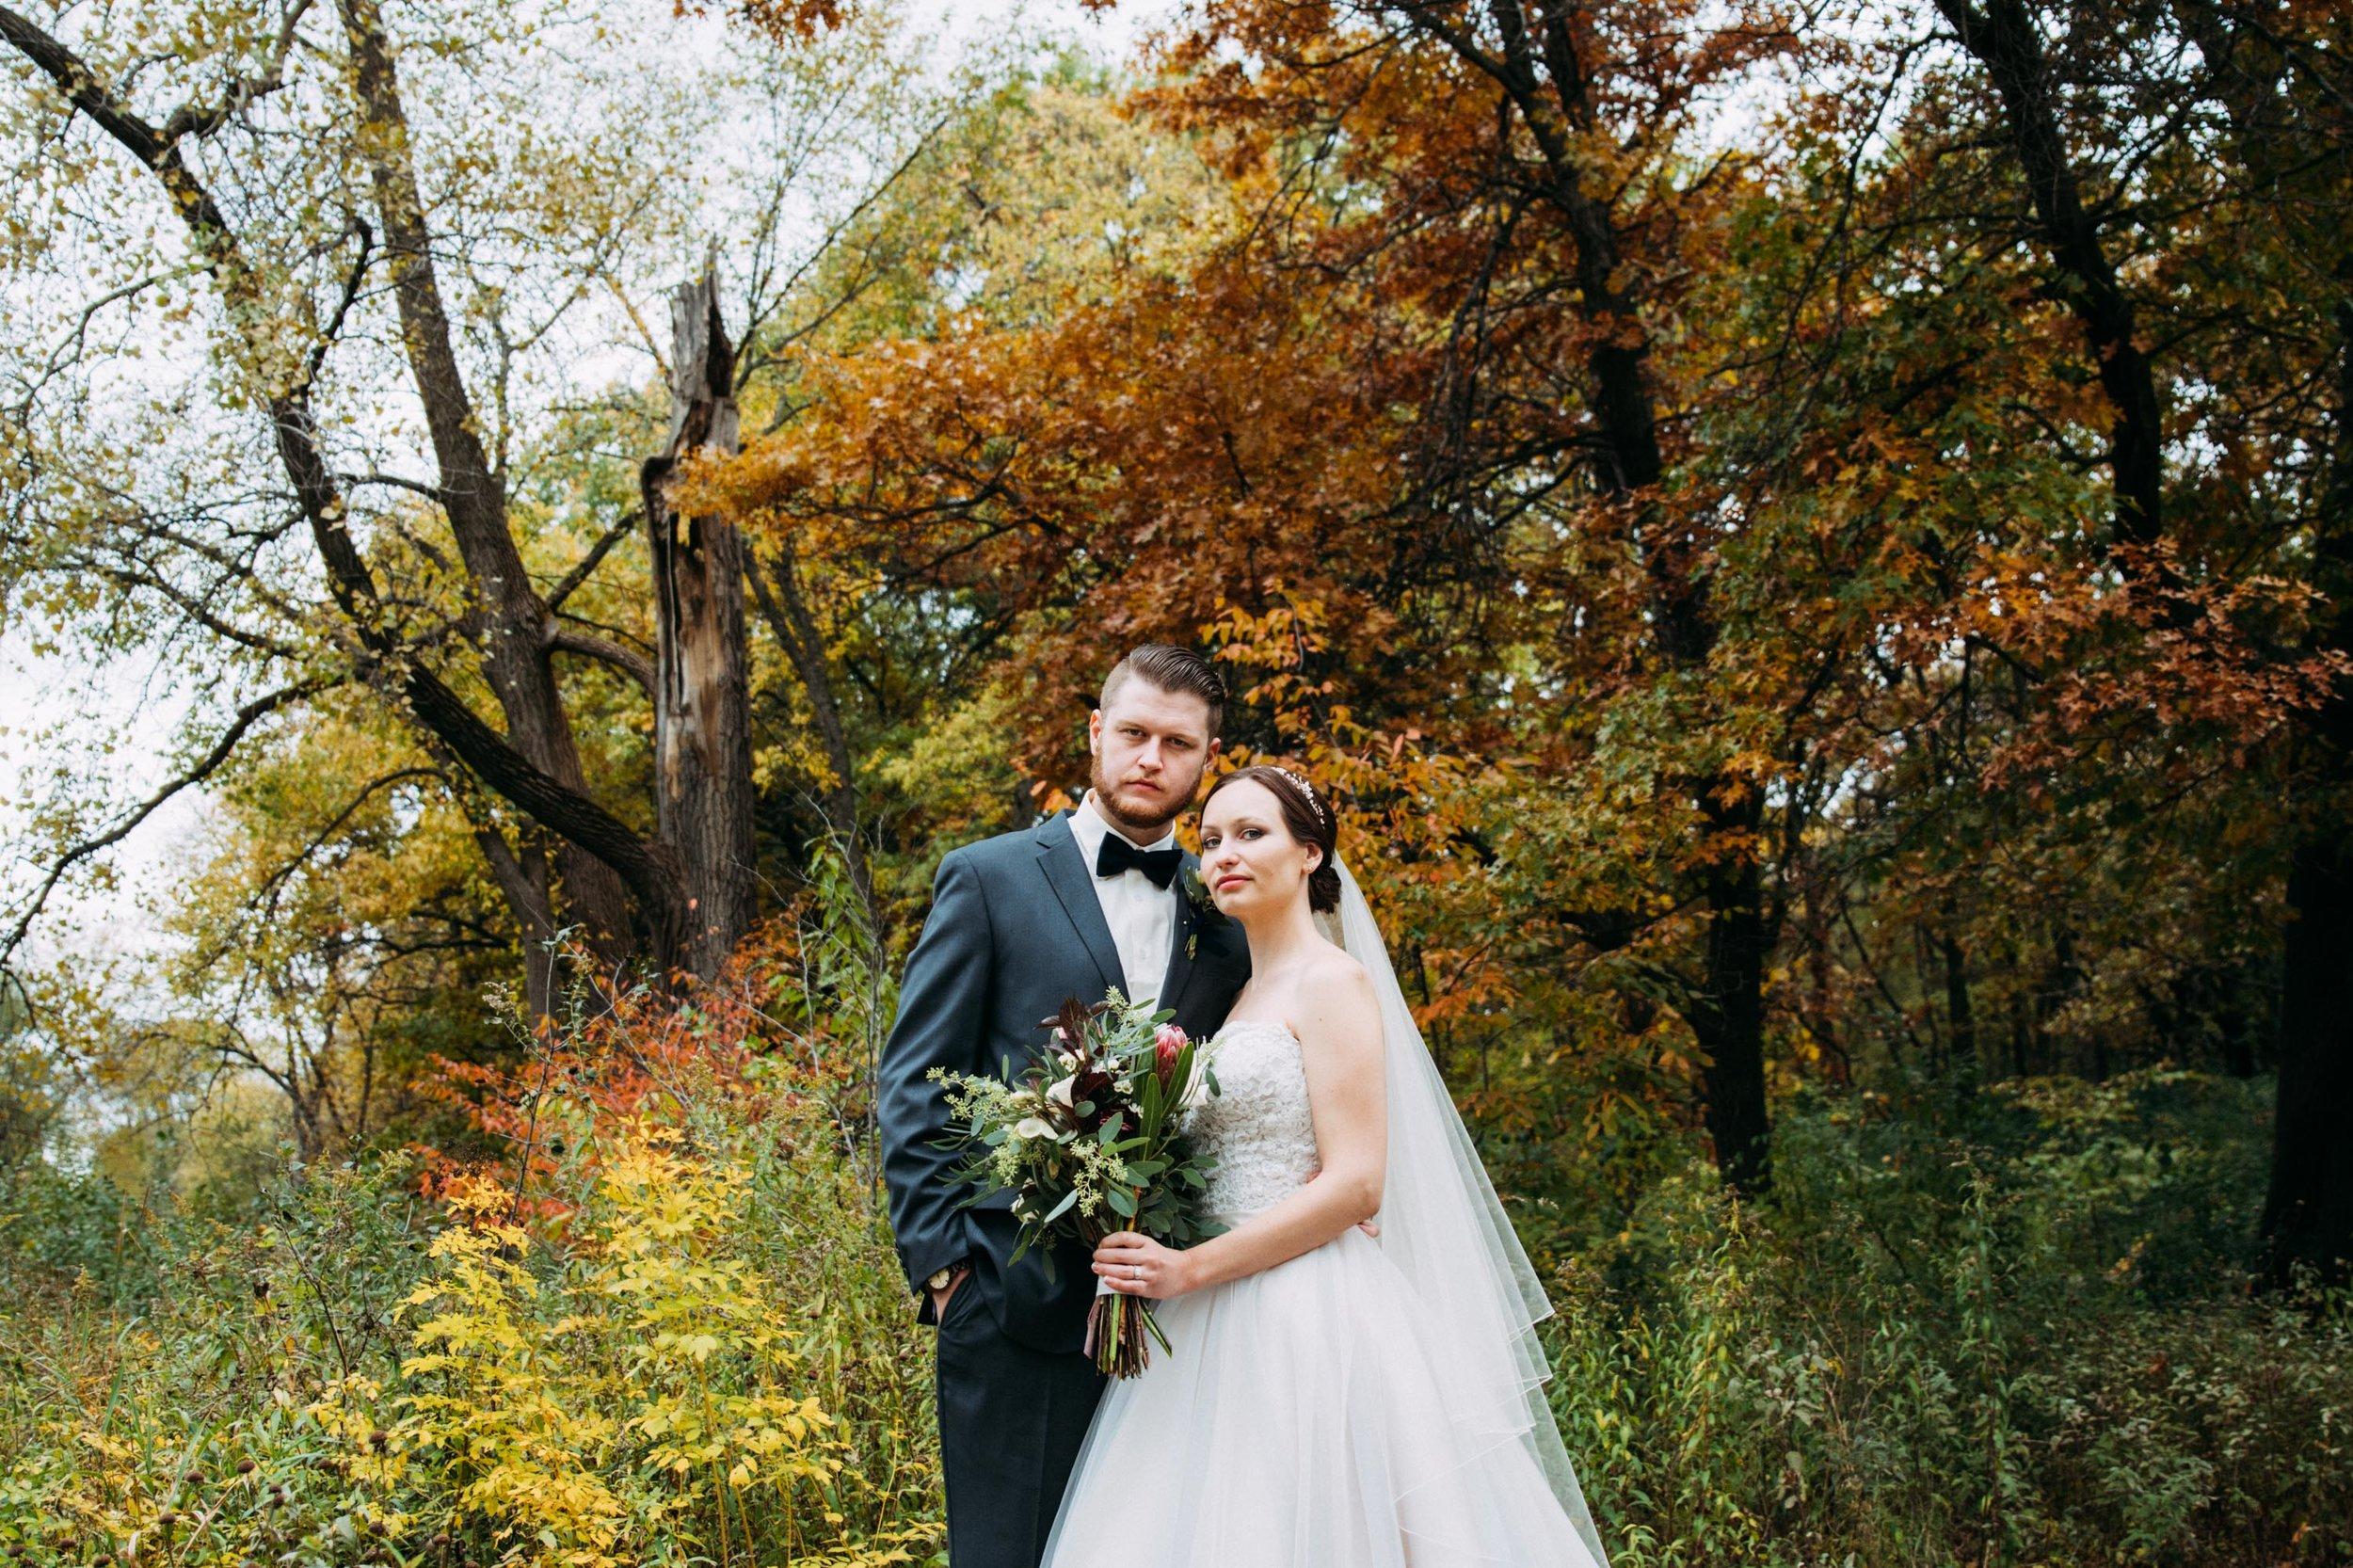 10-Sara_Tom_Bride_Groom_Portraits_Minneapolis_Wedding.jpg